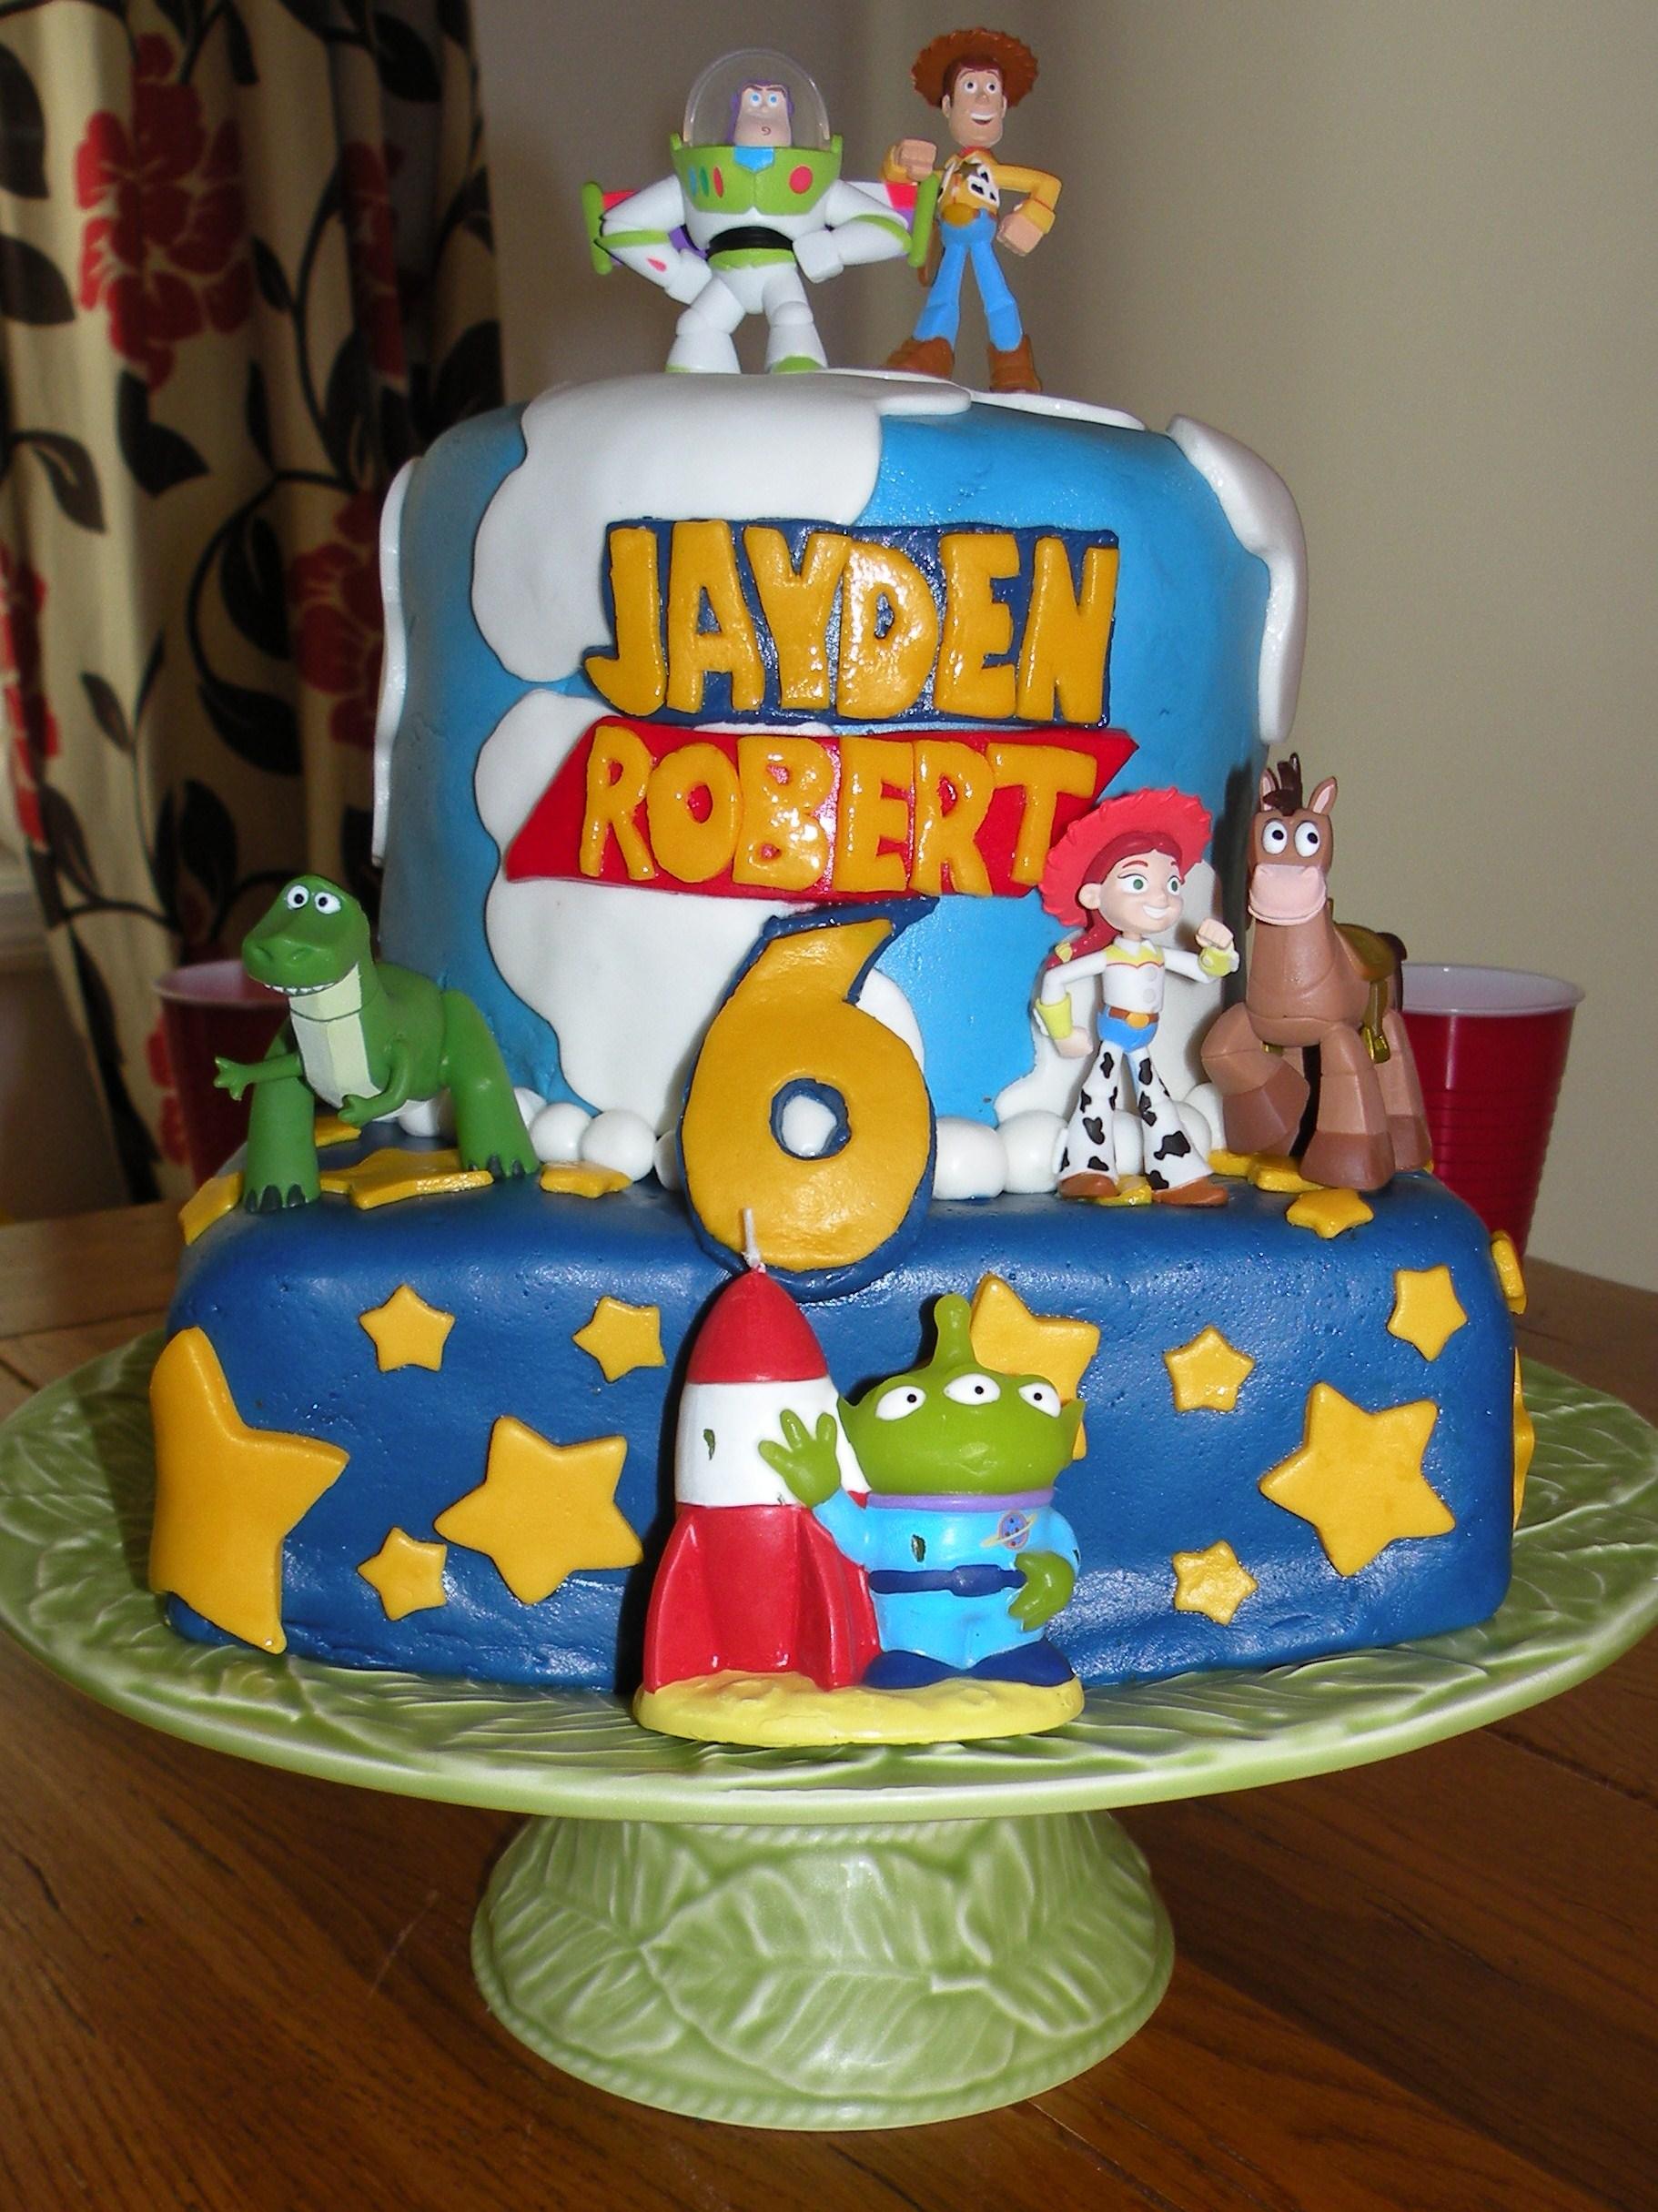 7 Boy From Cake Boss Cakes Photo Cake Boss Bakery Birthday Cakes